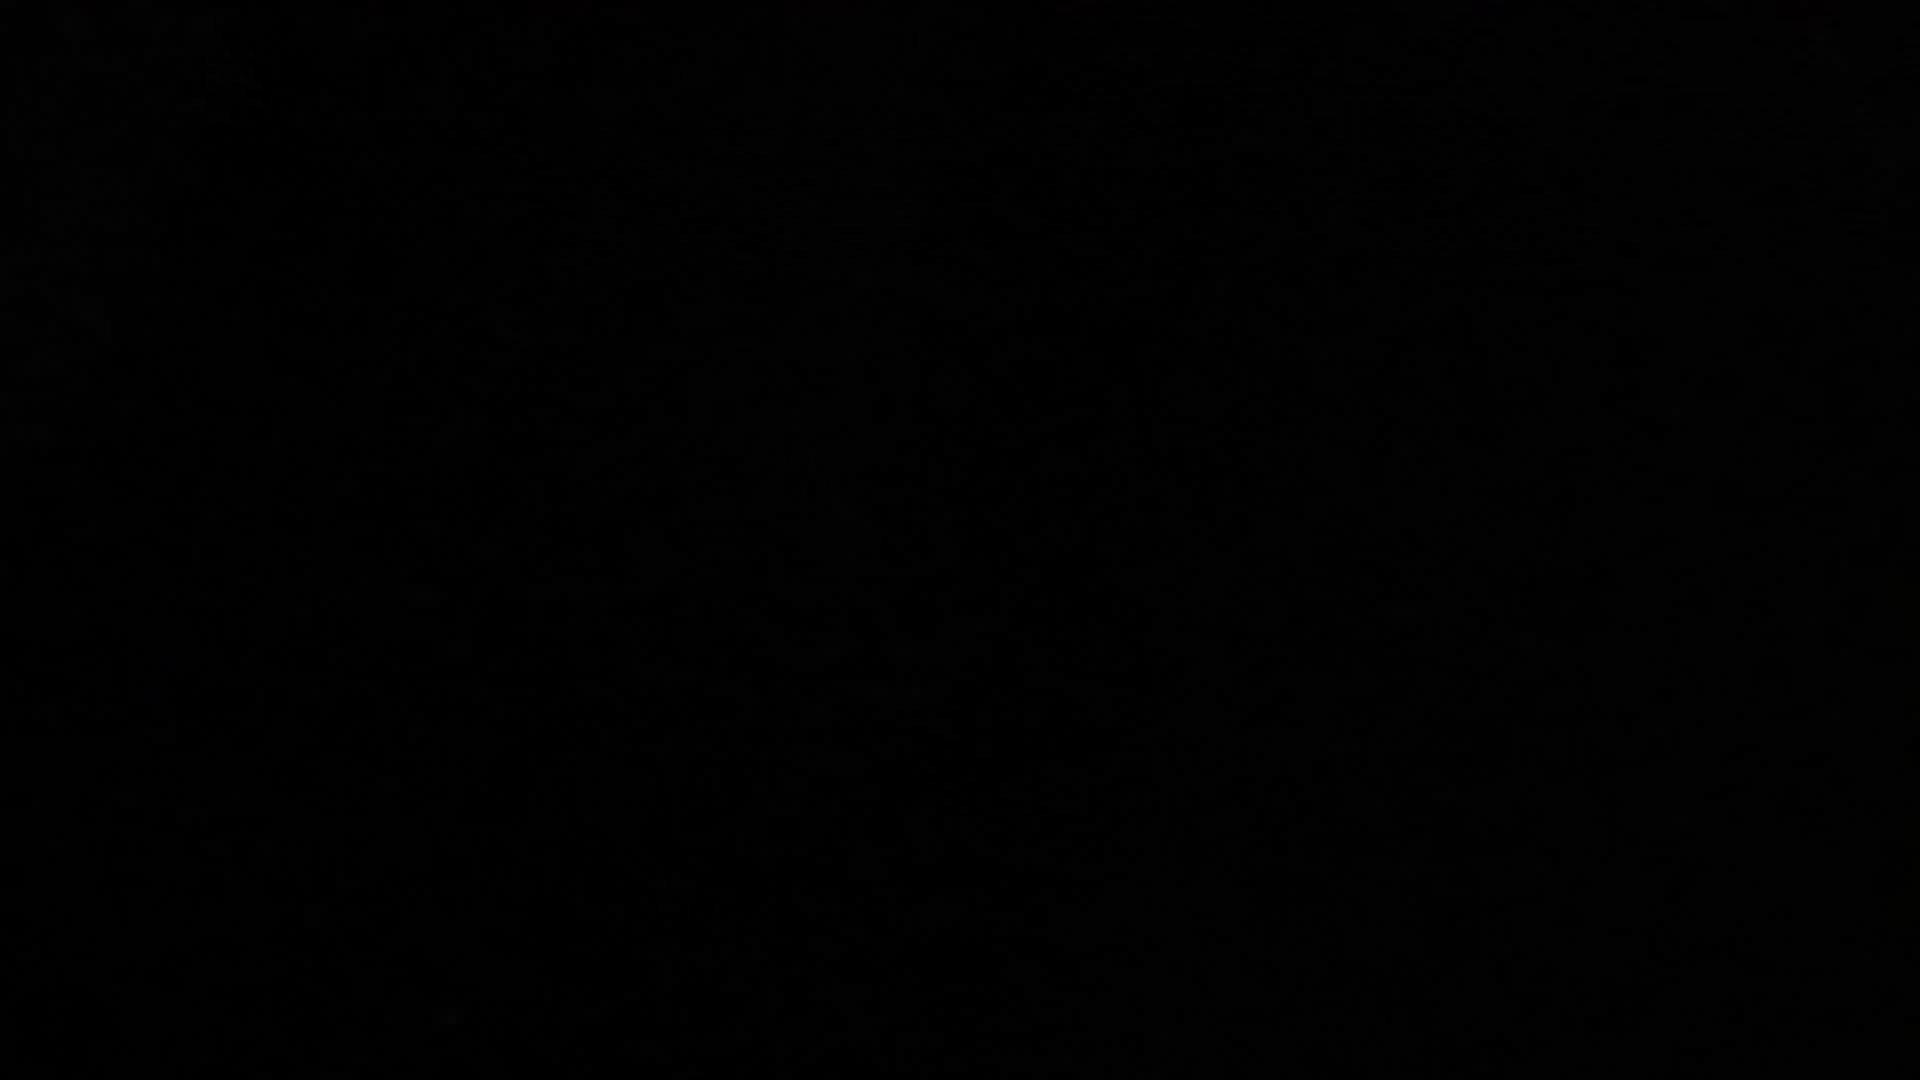 SPYさん初投稿!マンション覗き!5000K!ハイビジョン撮影VOL.01(現役野球部大学生編) スポーツ系男子 ゲイエロビデオ画像 95枚 45